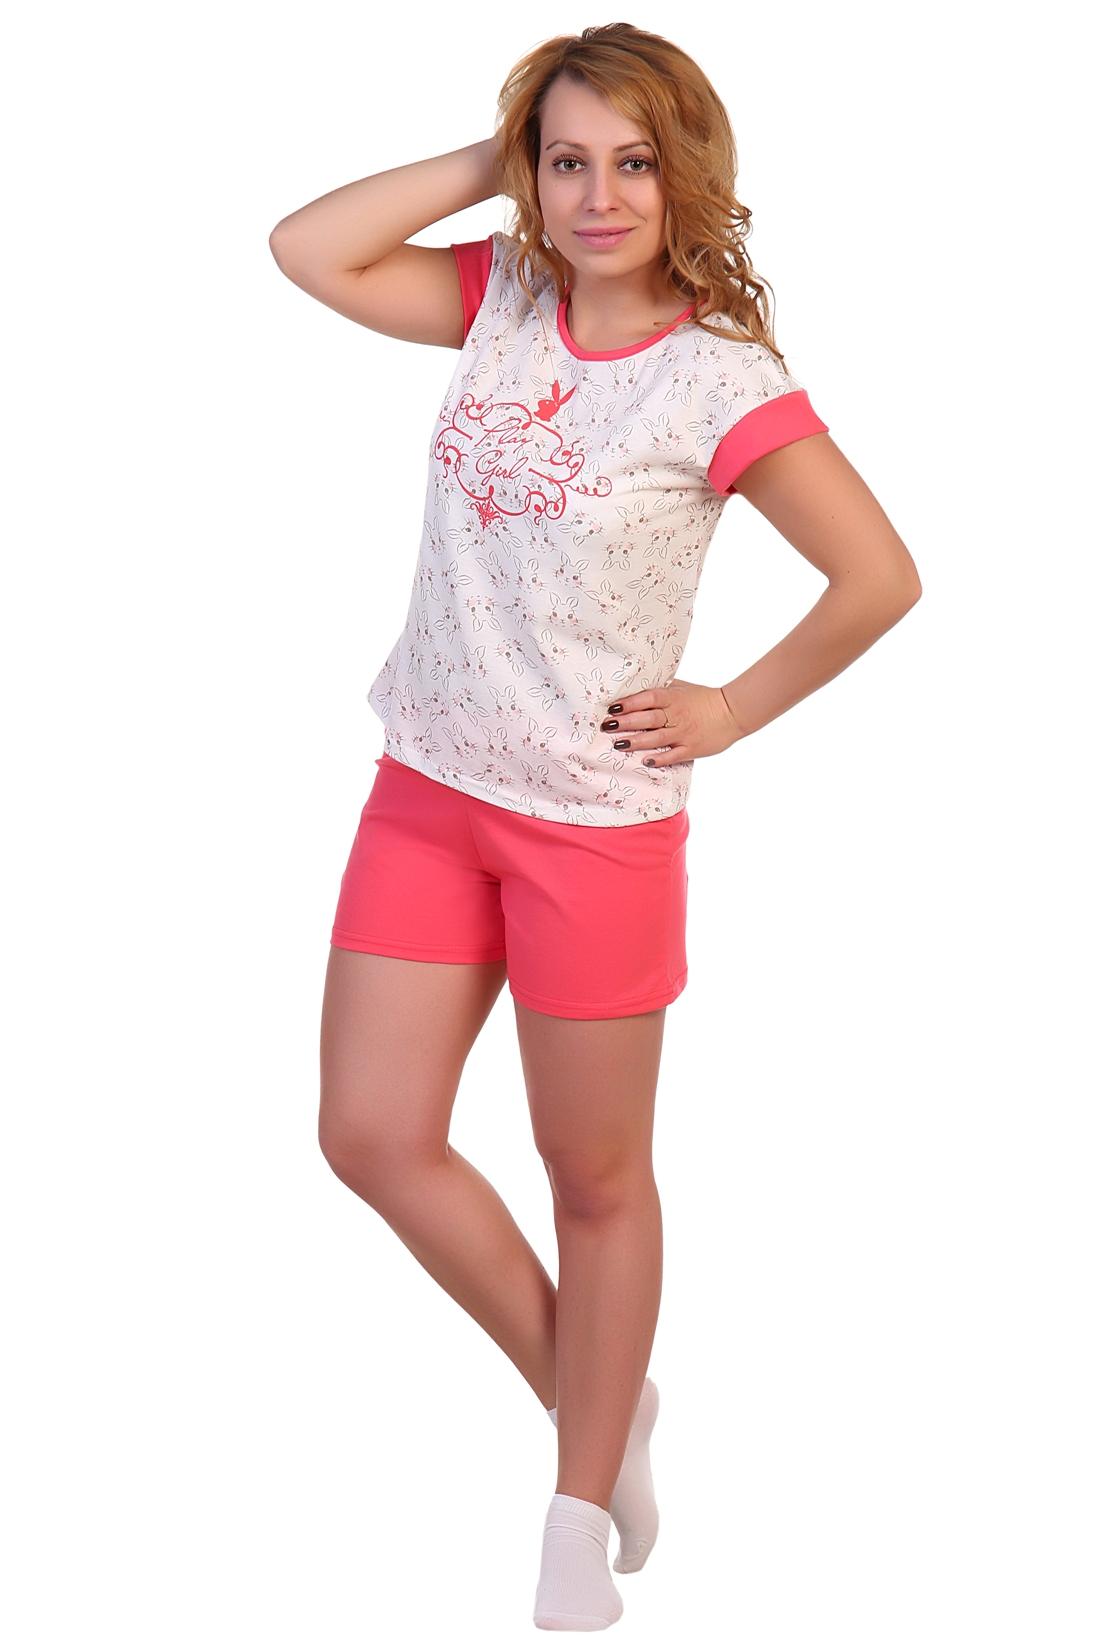 Жен. пижама арт. 16-0269 р. 44 пижама жен mia cara майка шорты botanical aw15 ubl lst 264 р 42 44 1119503